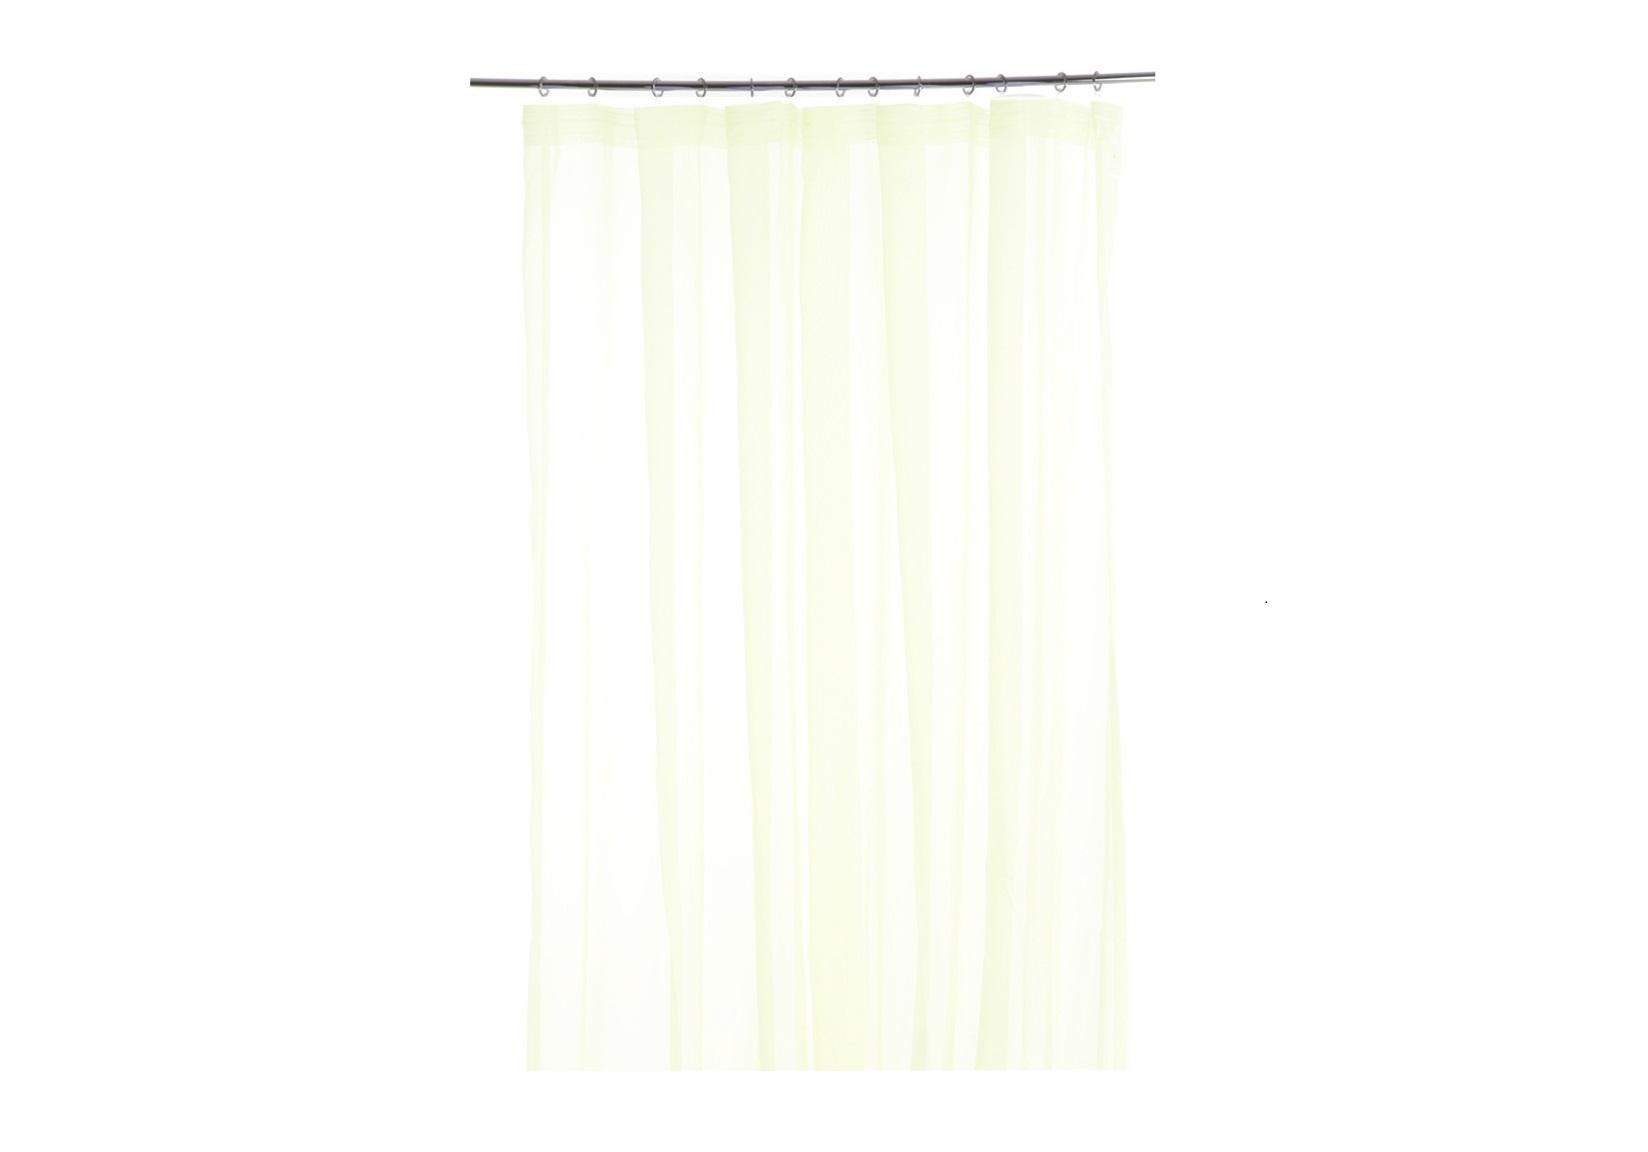 Тюль ButterflyШторы<br>Тюль легкая на окно на тесьме для крючков.<br><br>Material: Тюль<br>Width см: 300<br>Height см: 270